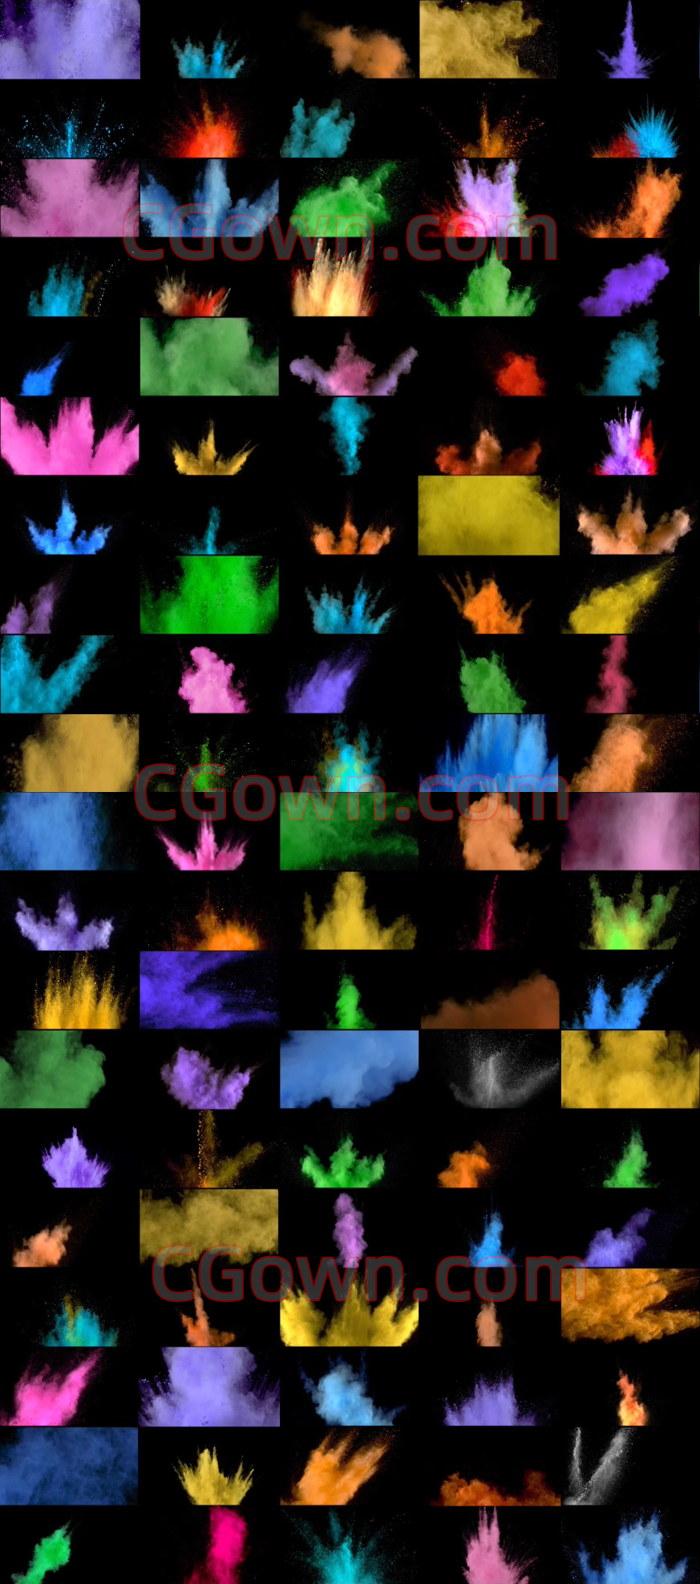 4K视频素材130种色彩缤纷粉末爆炸喷射带Alpha遮罩89GB大